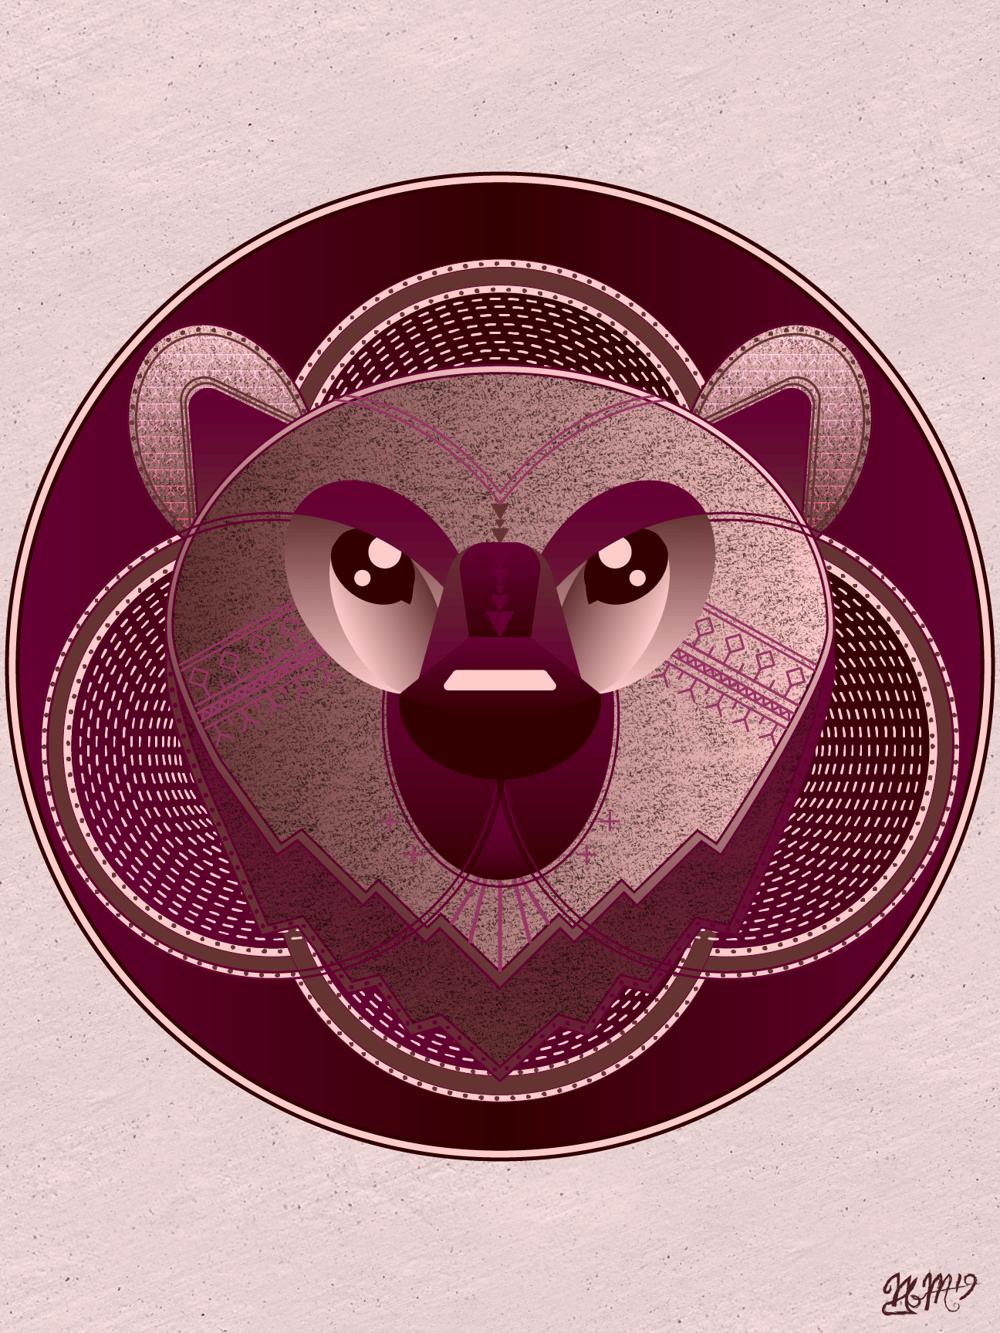 Polar Bear - image 9 - student project